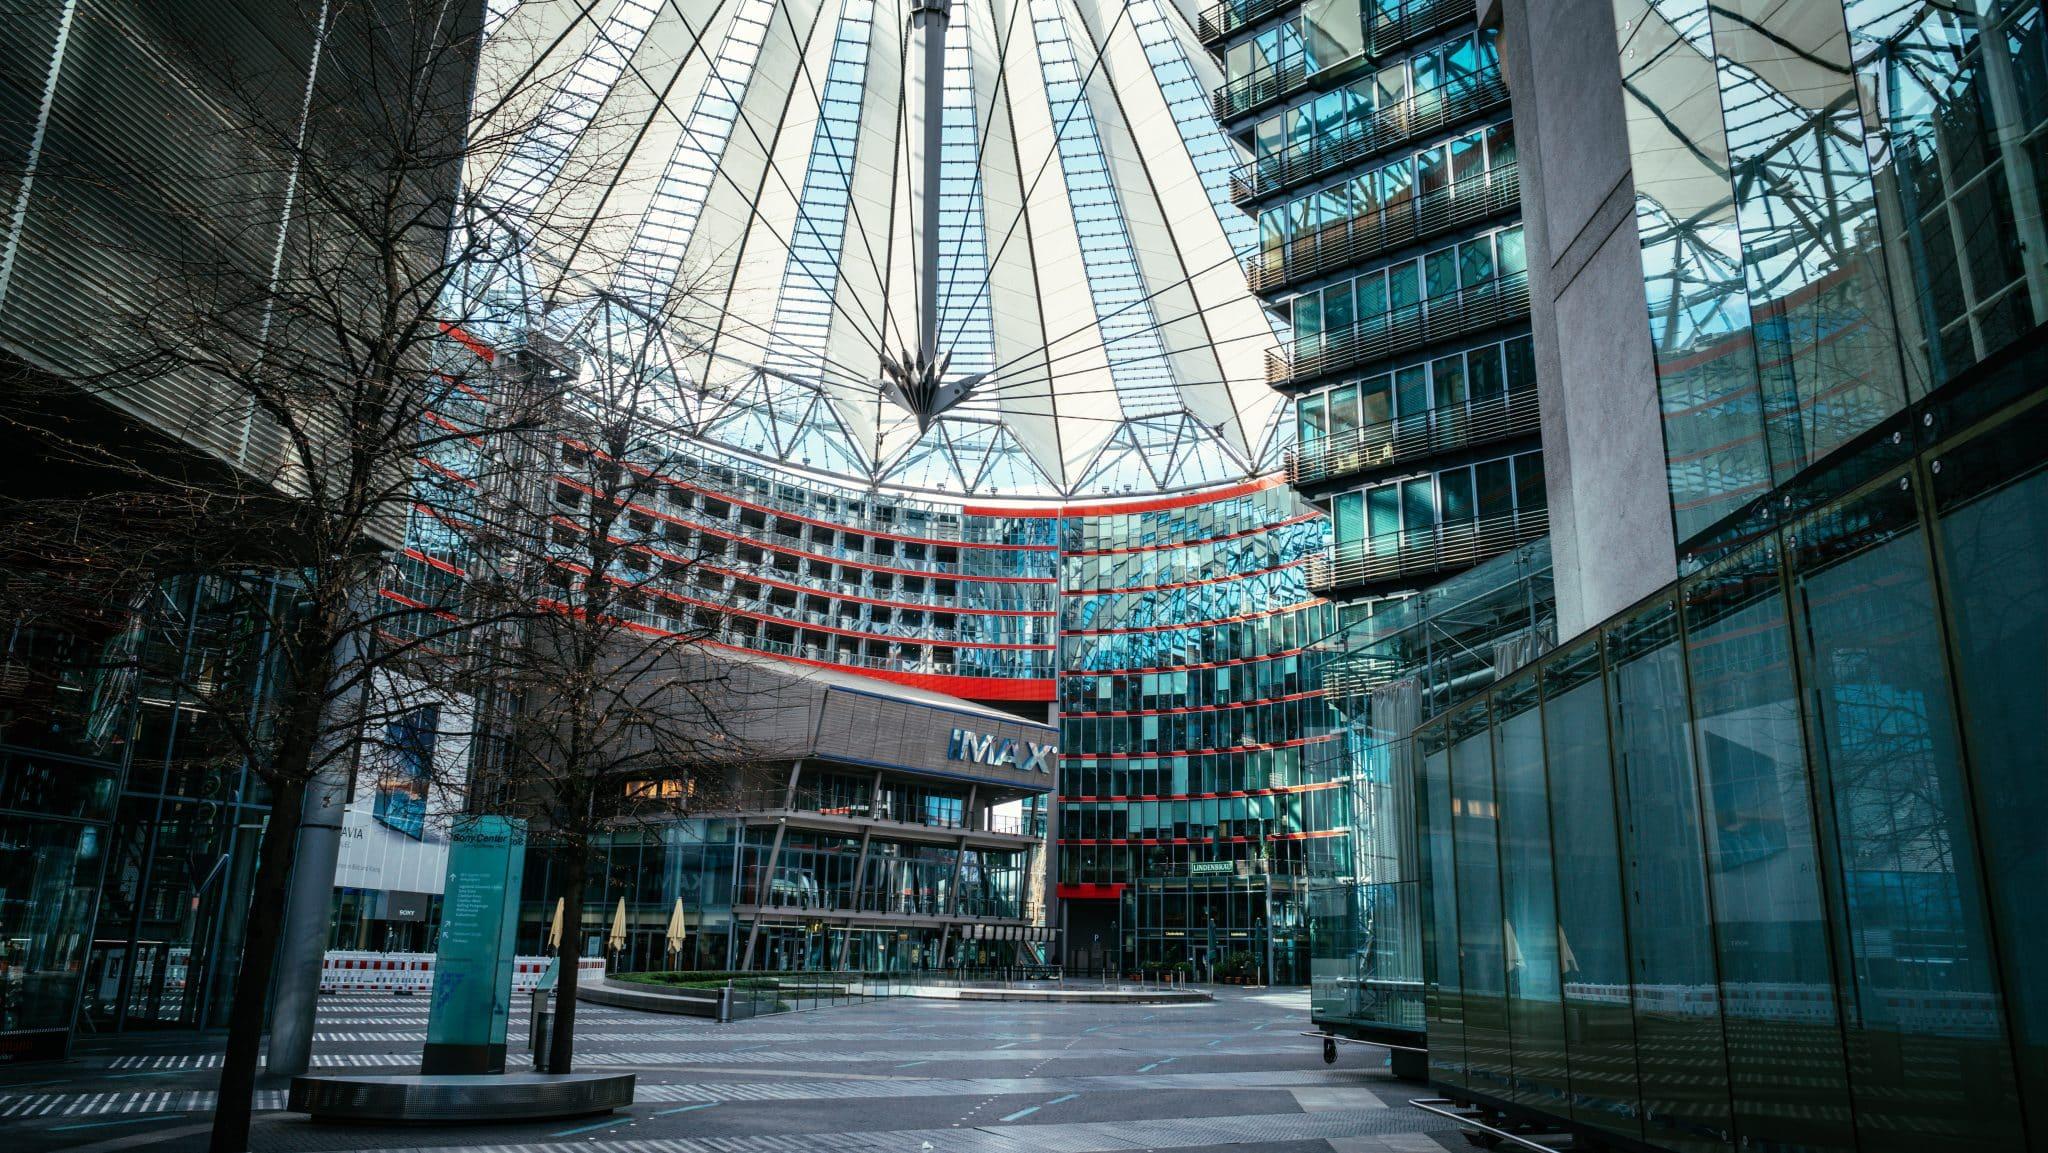 Potsdamer Platz and the Sony Centre